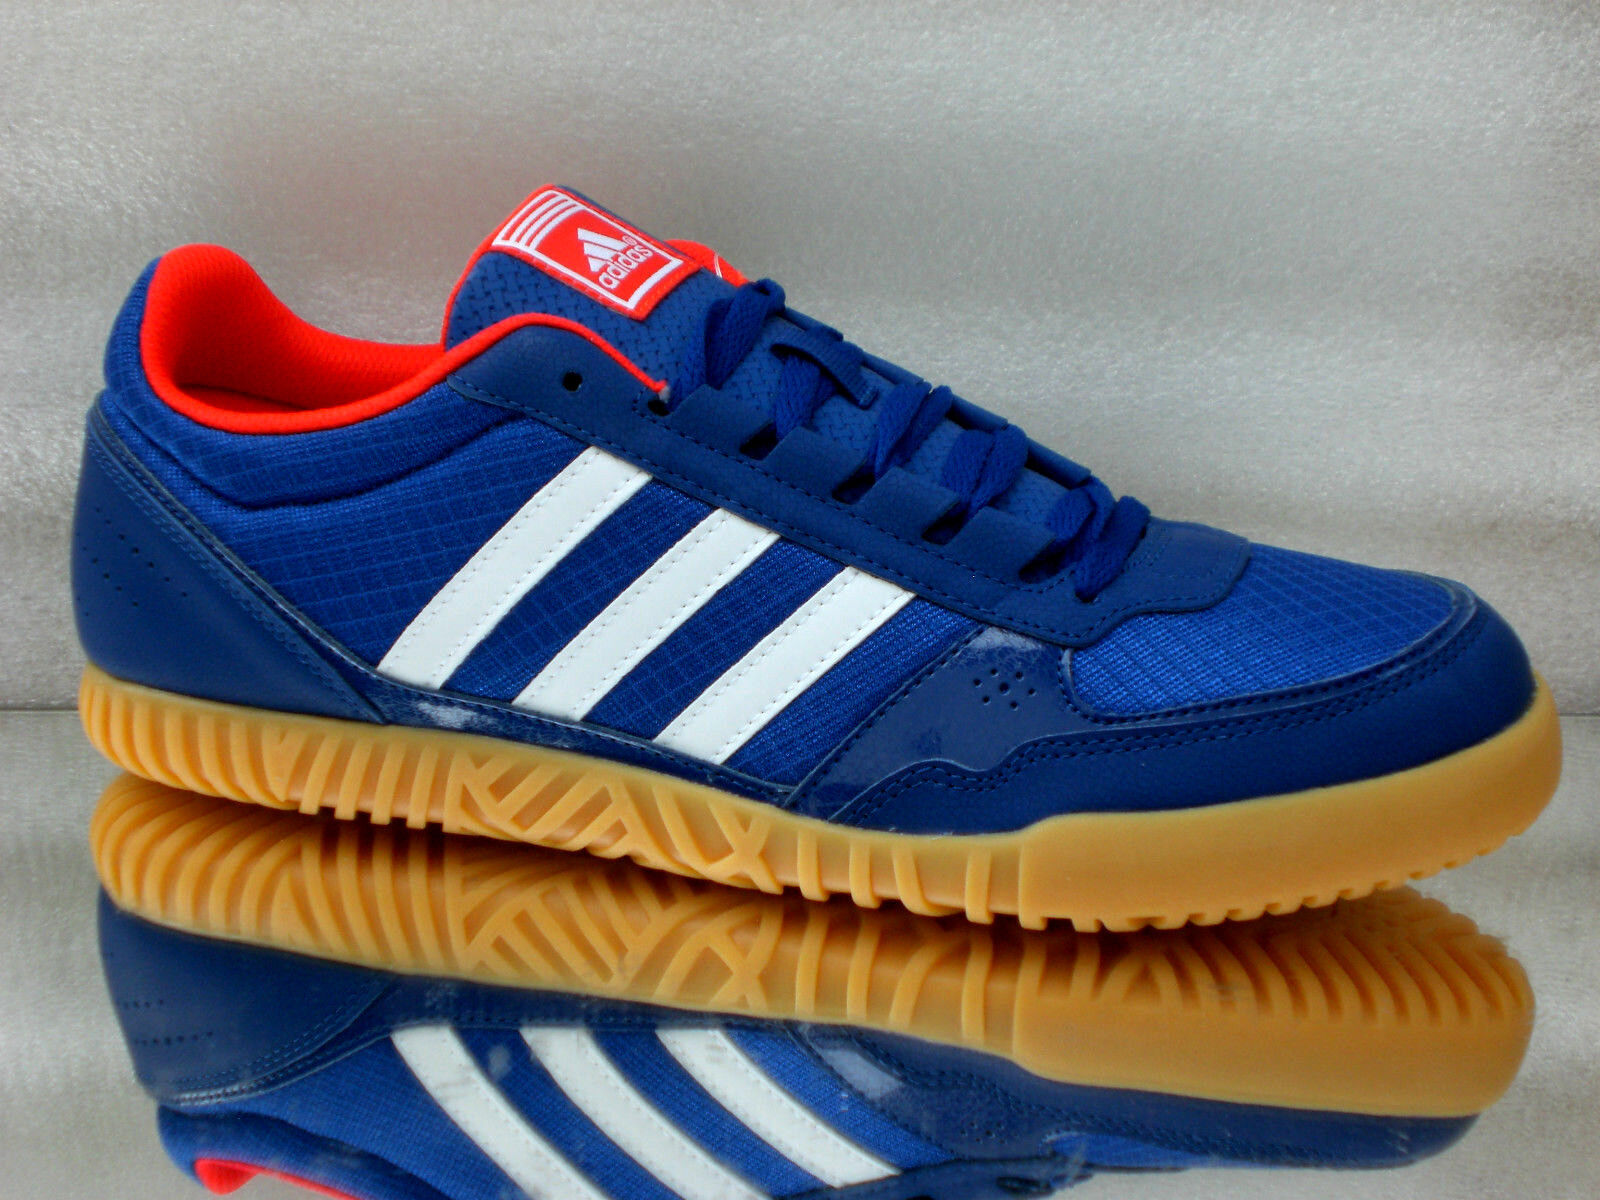 ADIDAS Rocco Giangi Freizeit Turn / Laufschuhe Sneakers Unisex blau Q21388 Neu